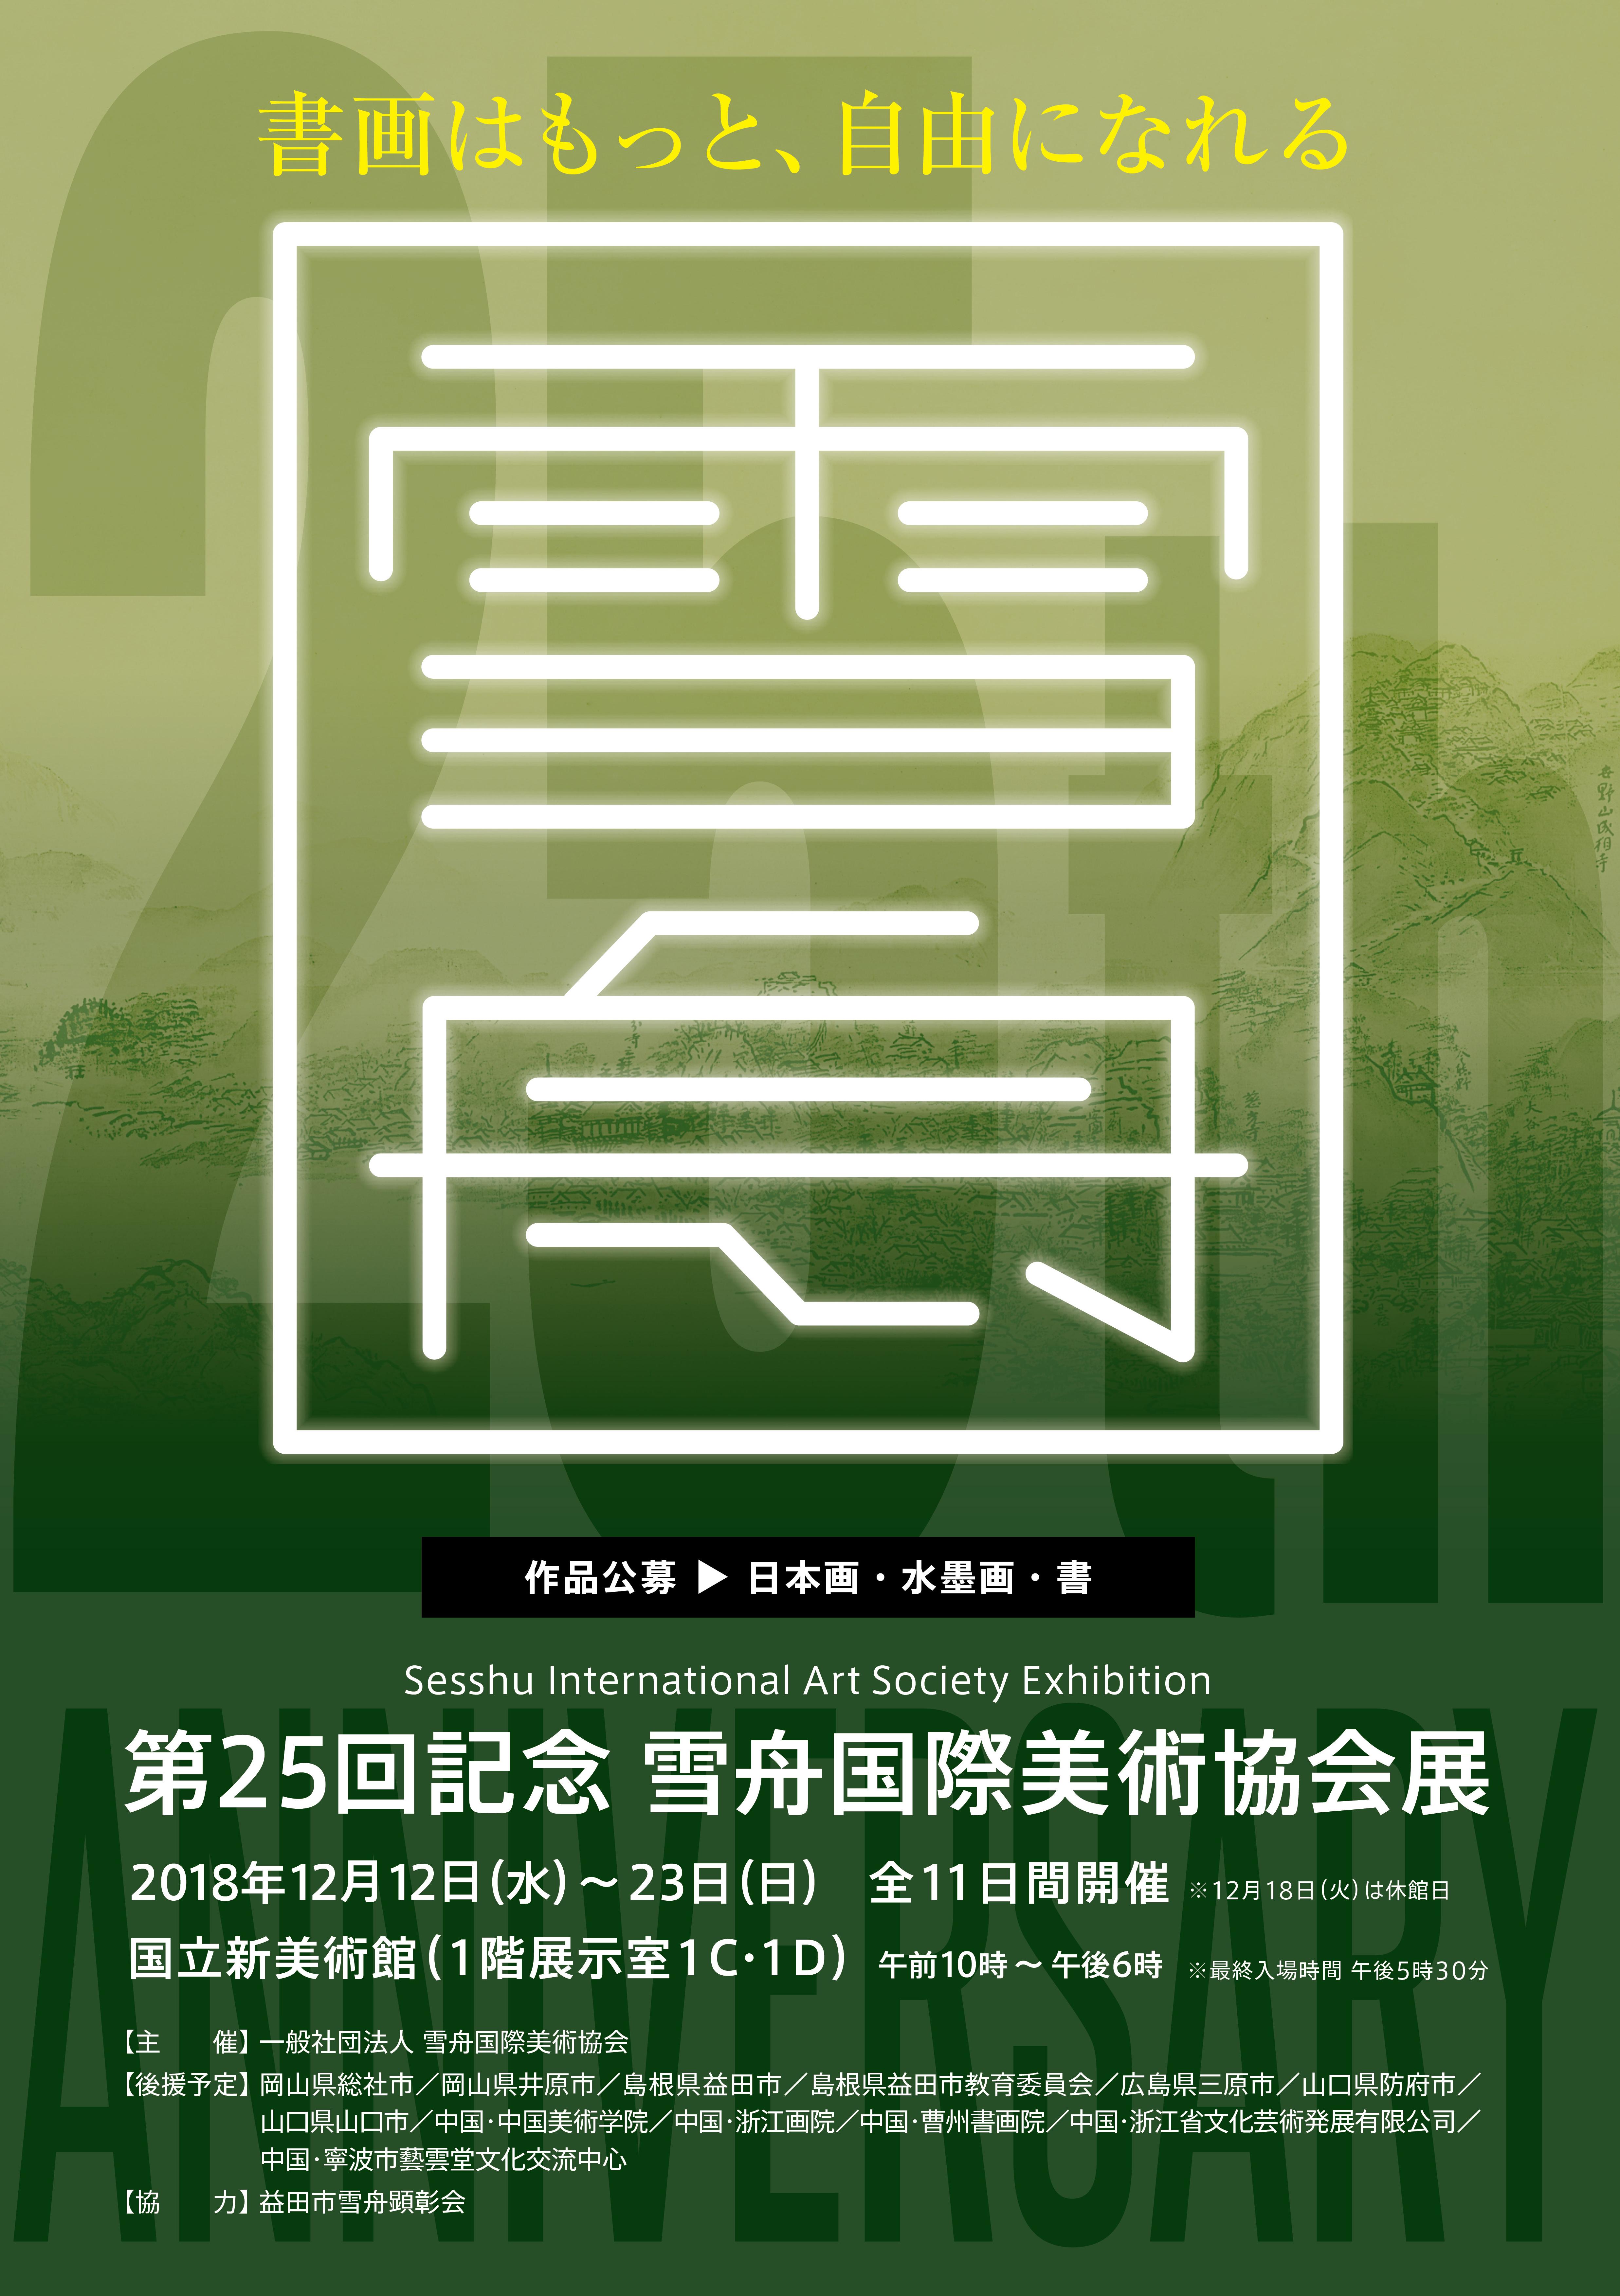 第25回雪舟国際美術協会展ポスター